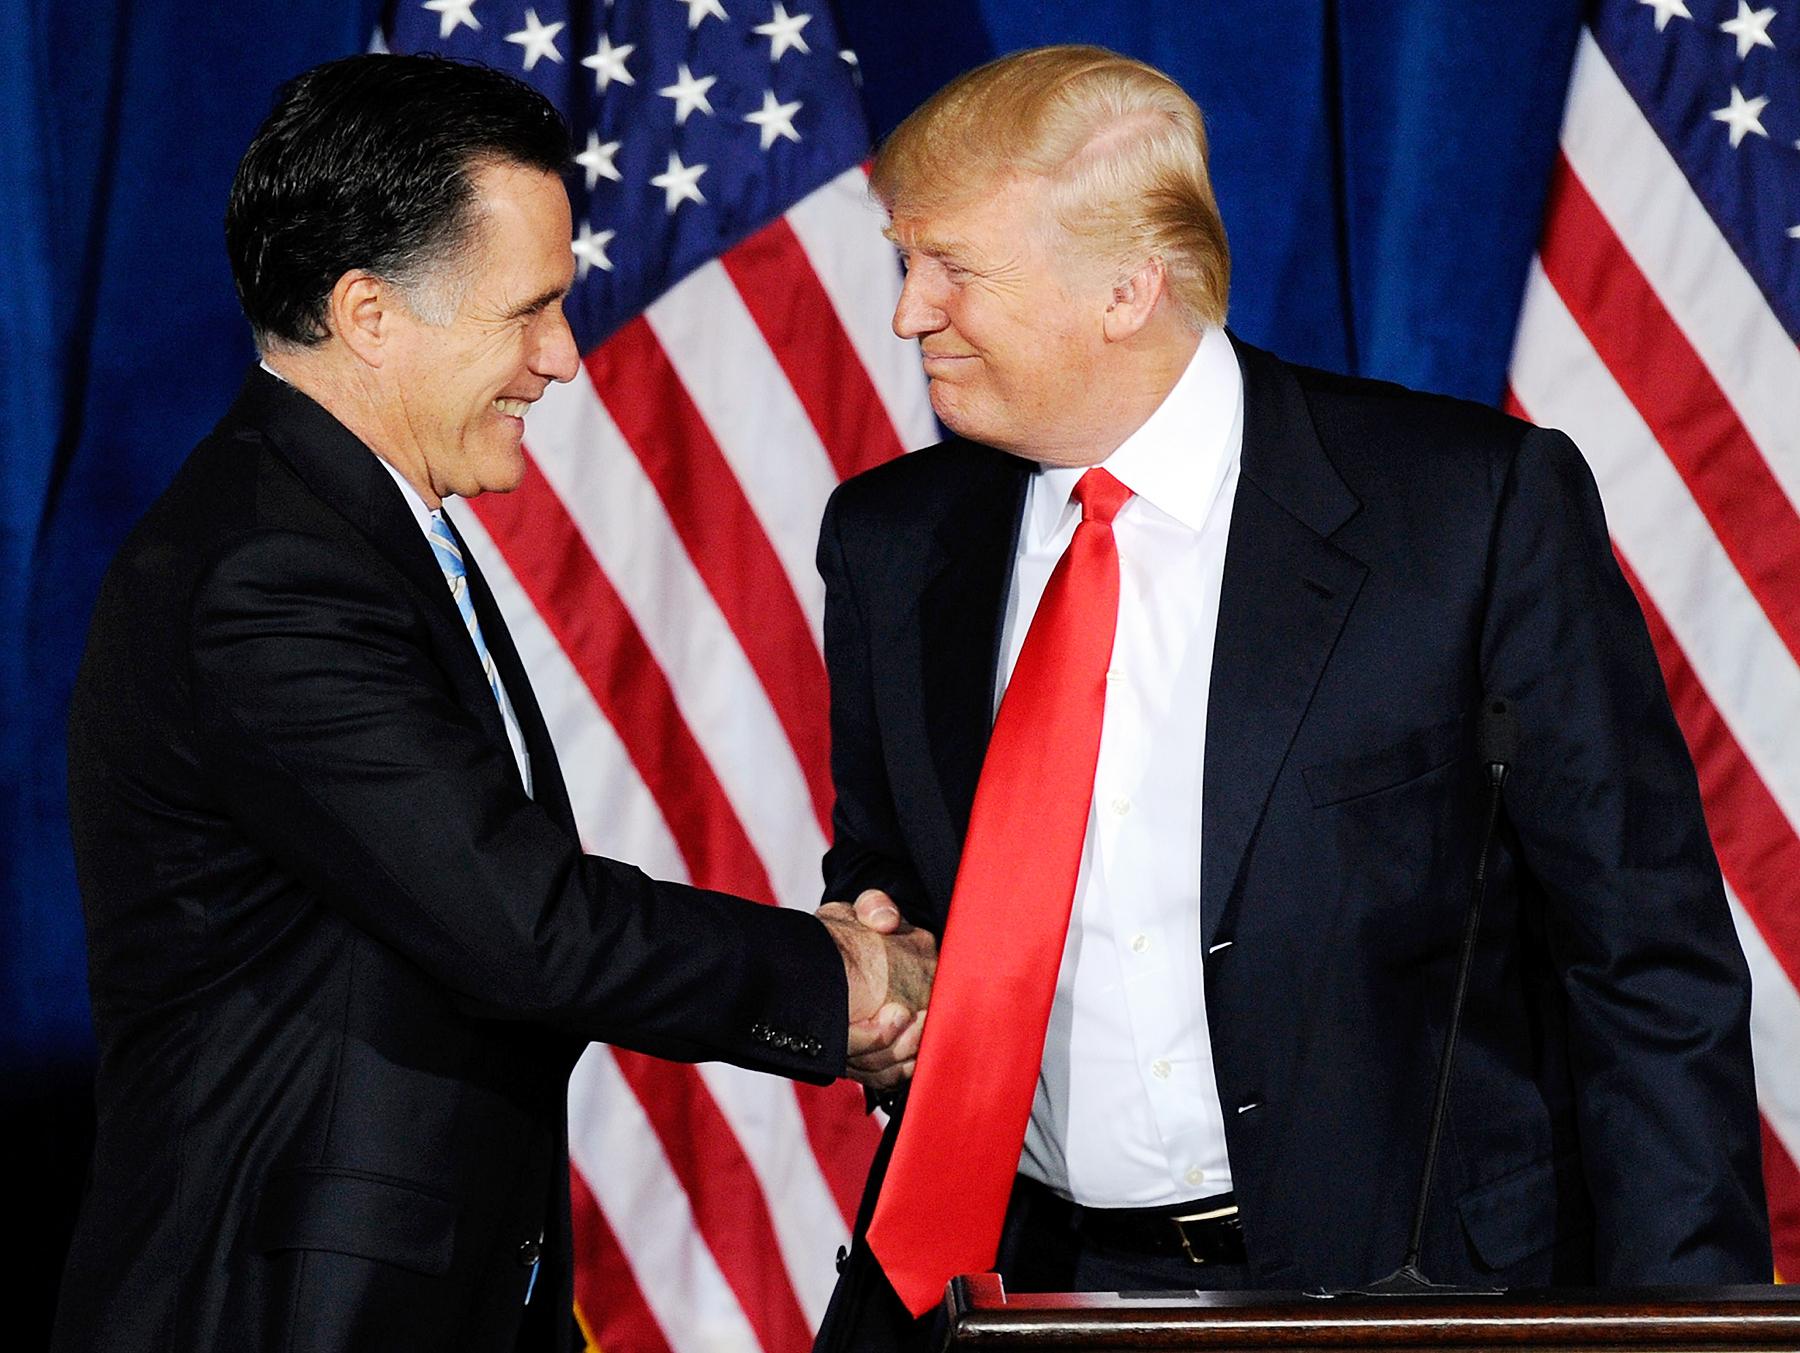 Mitt Romney and Donald Trump in 2012